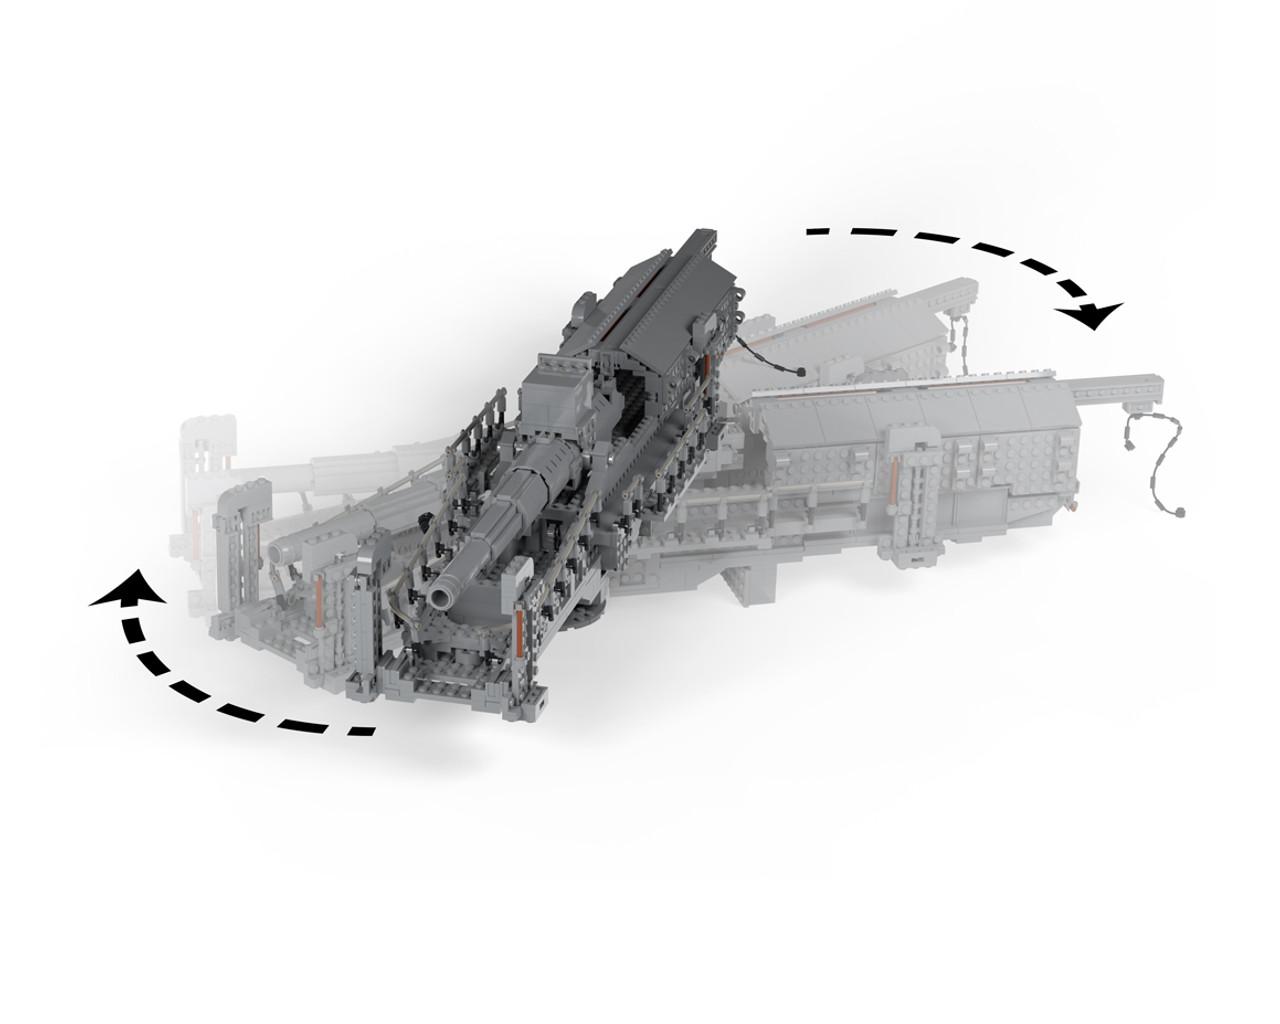 Bruno - 28 cm SK L/40 Railway Gun